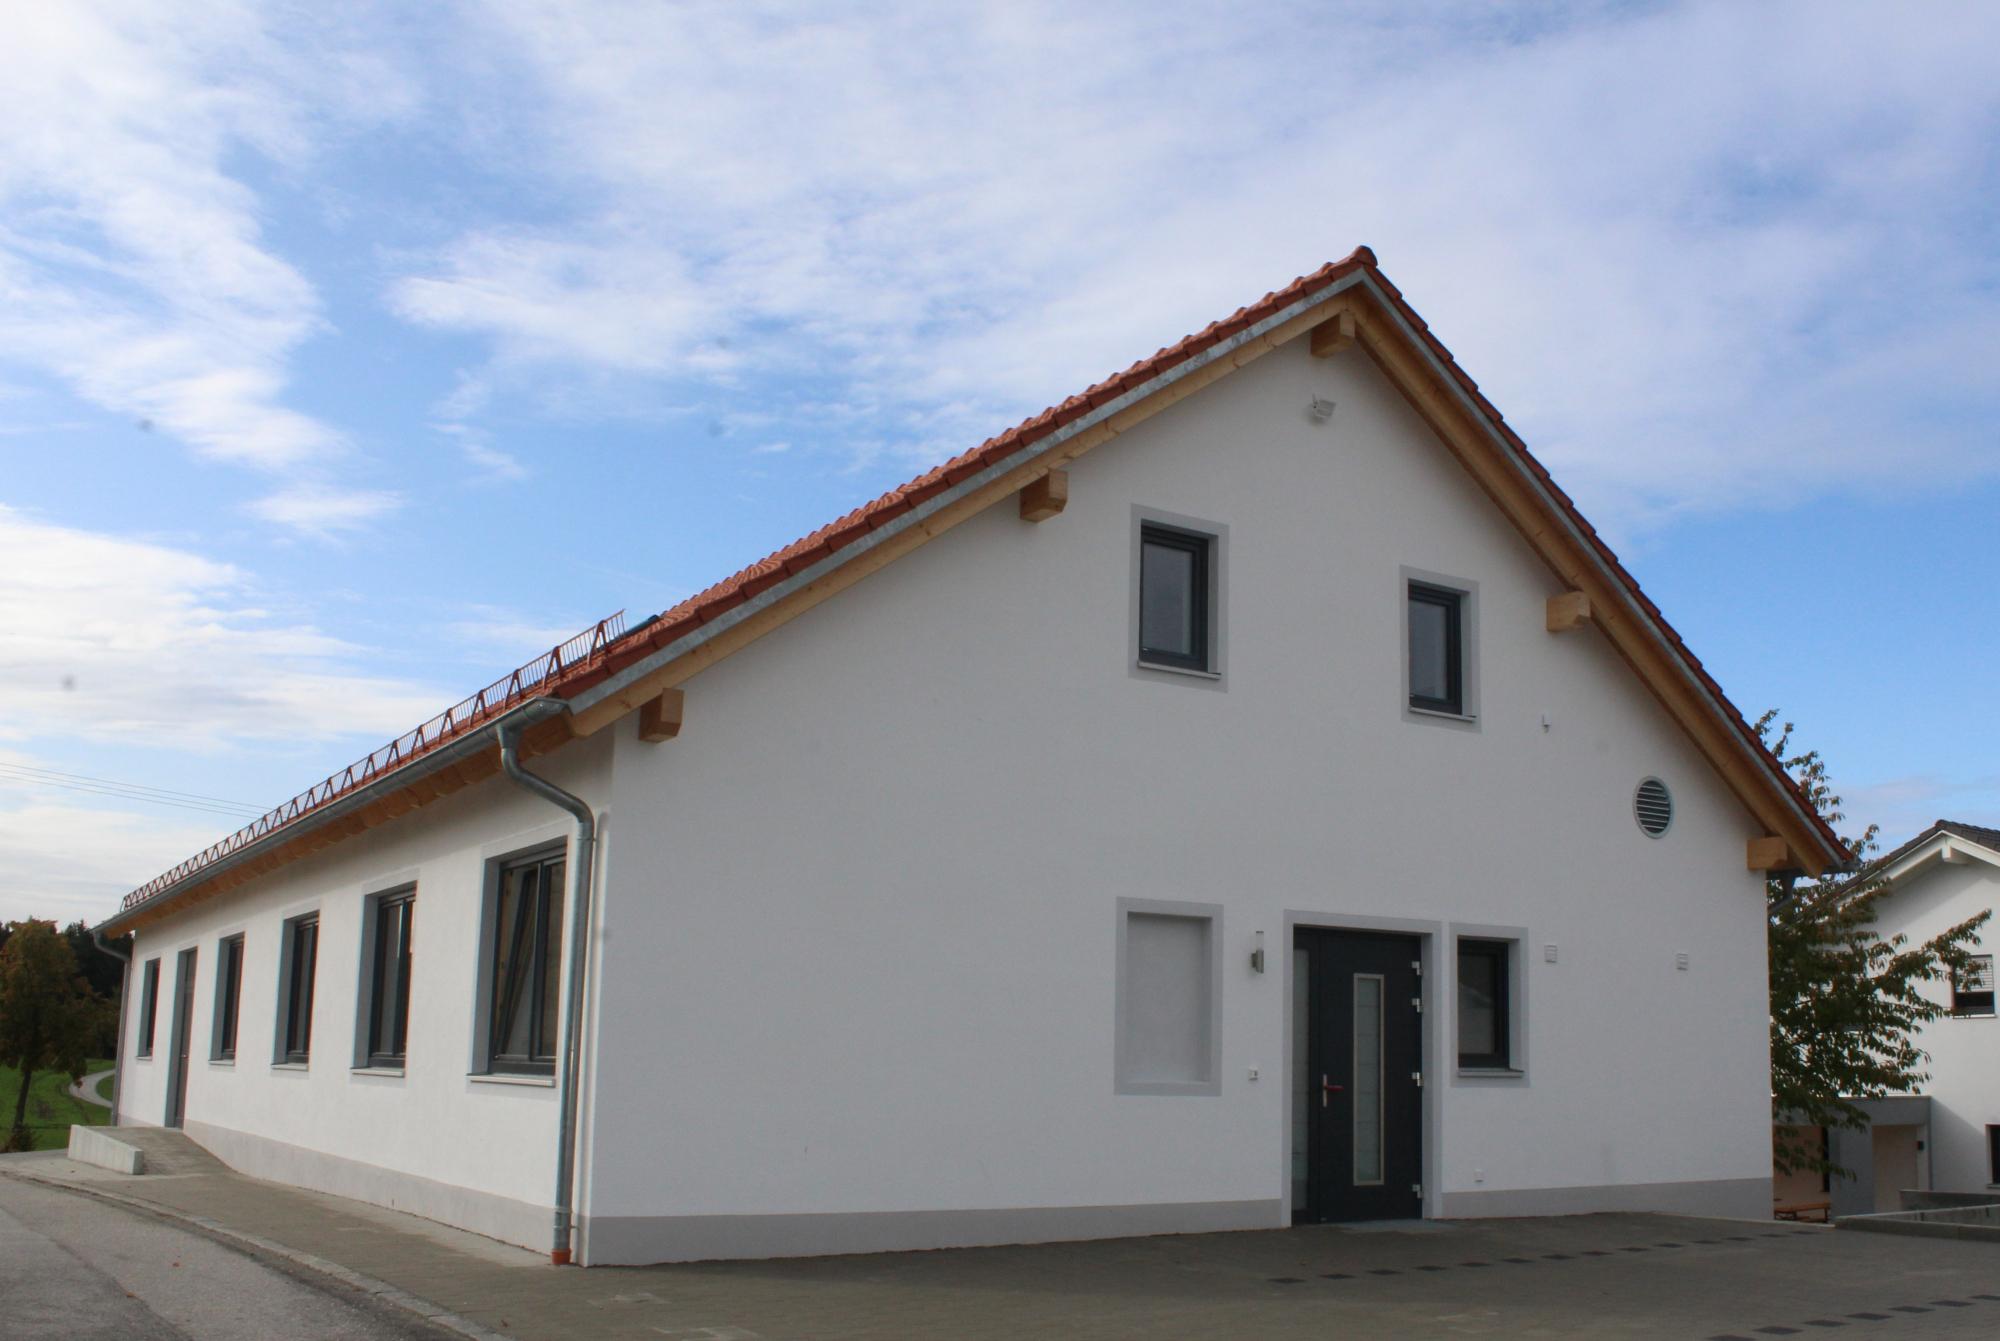 Dorfhaus Mitterhausen1